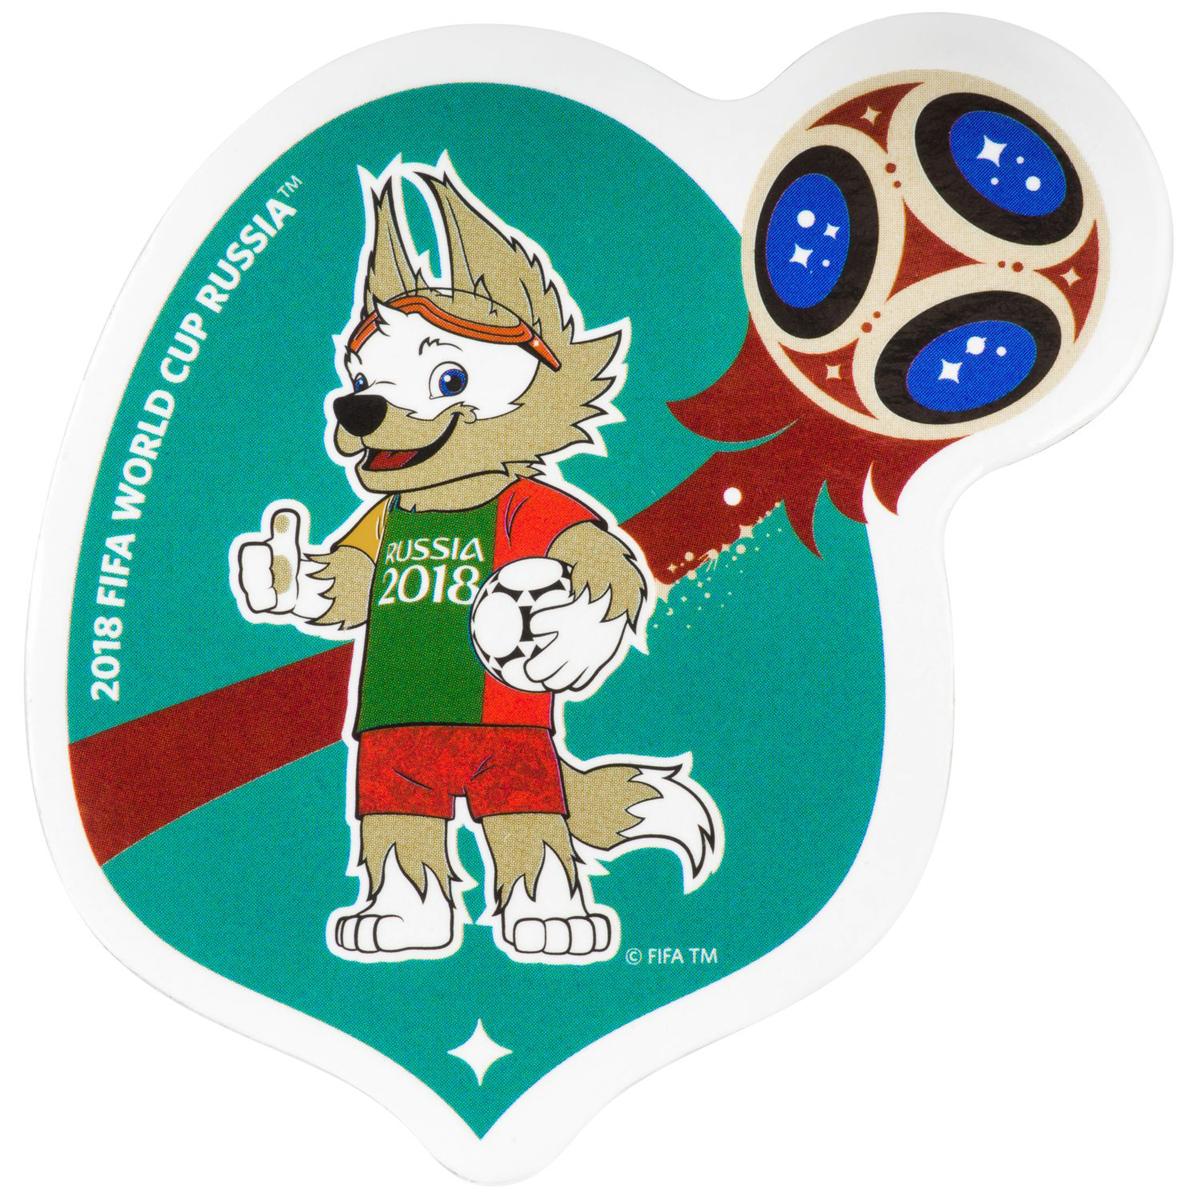 Магнит сувенирный FIFA 2018 Забивака Хорватия, 8 х 11 см. СН540 iphone 4 в хорватии